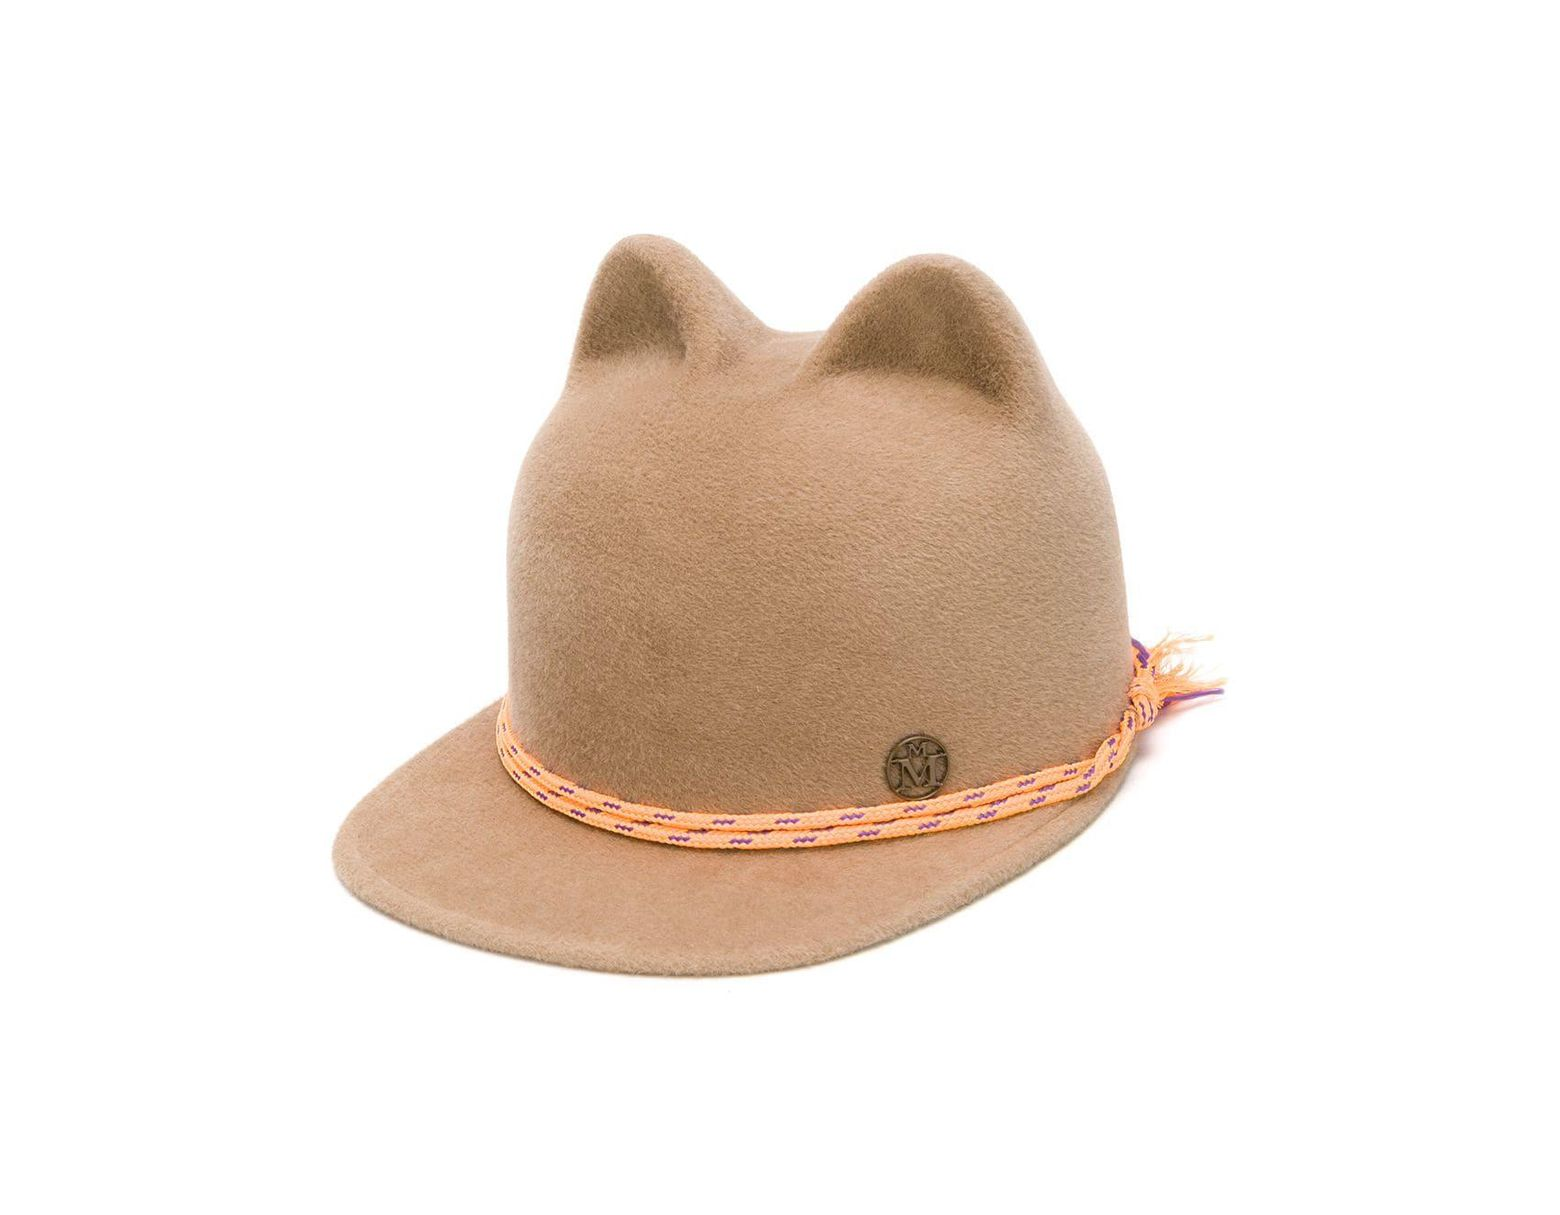 07dcac4d8 Maison Michel Animal Ear Cap in Brown - Lyst